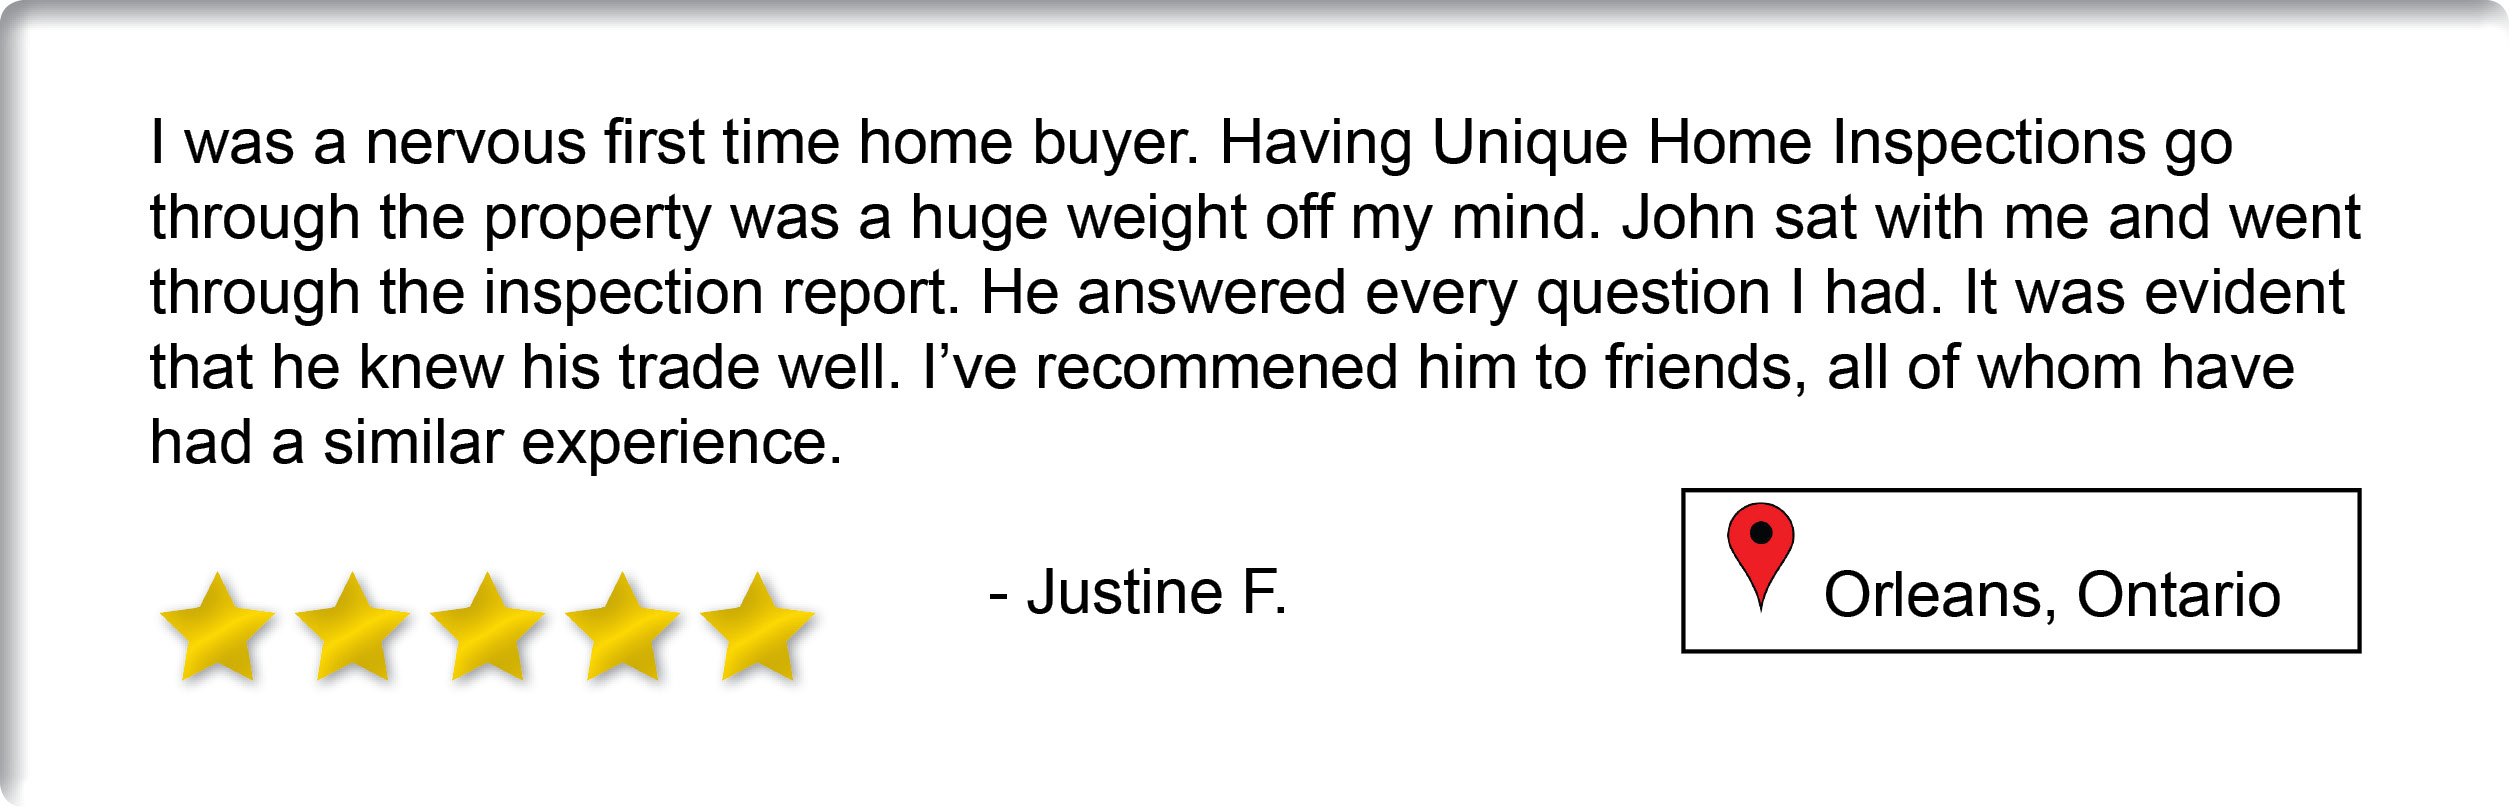 Justine F.